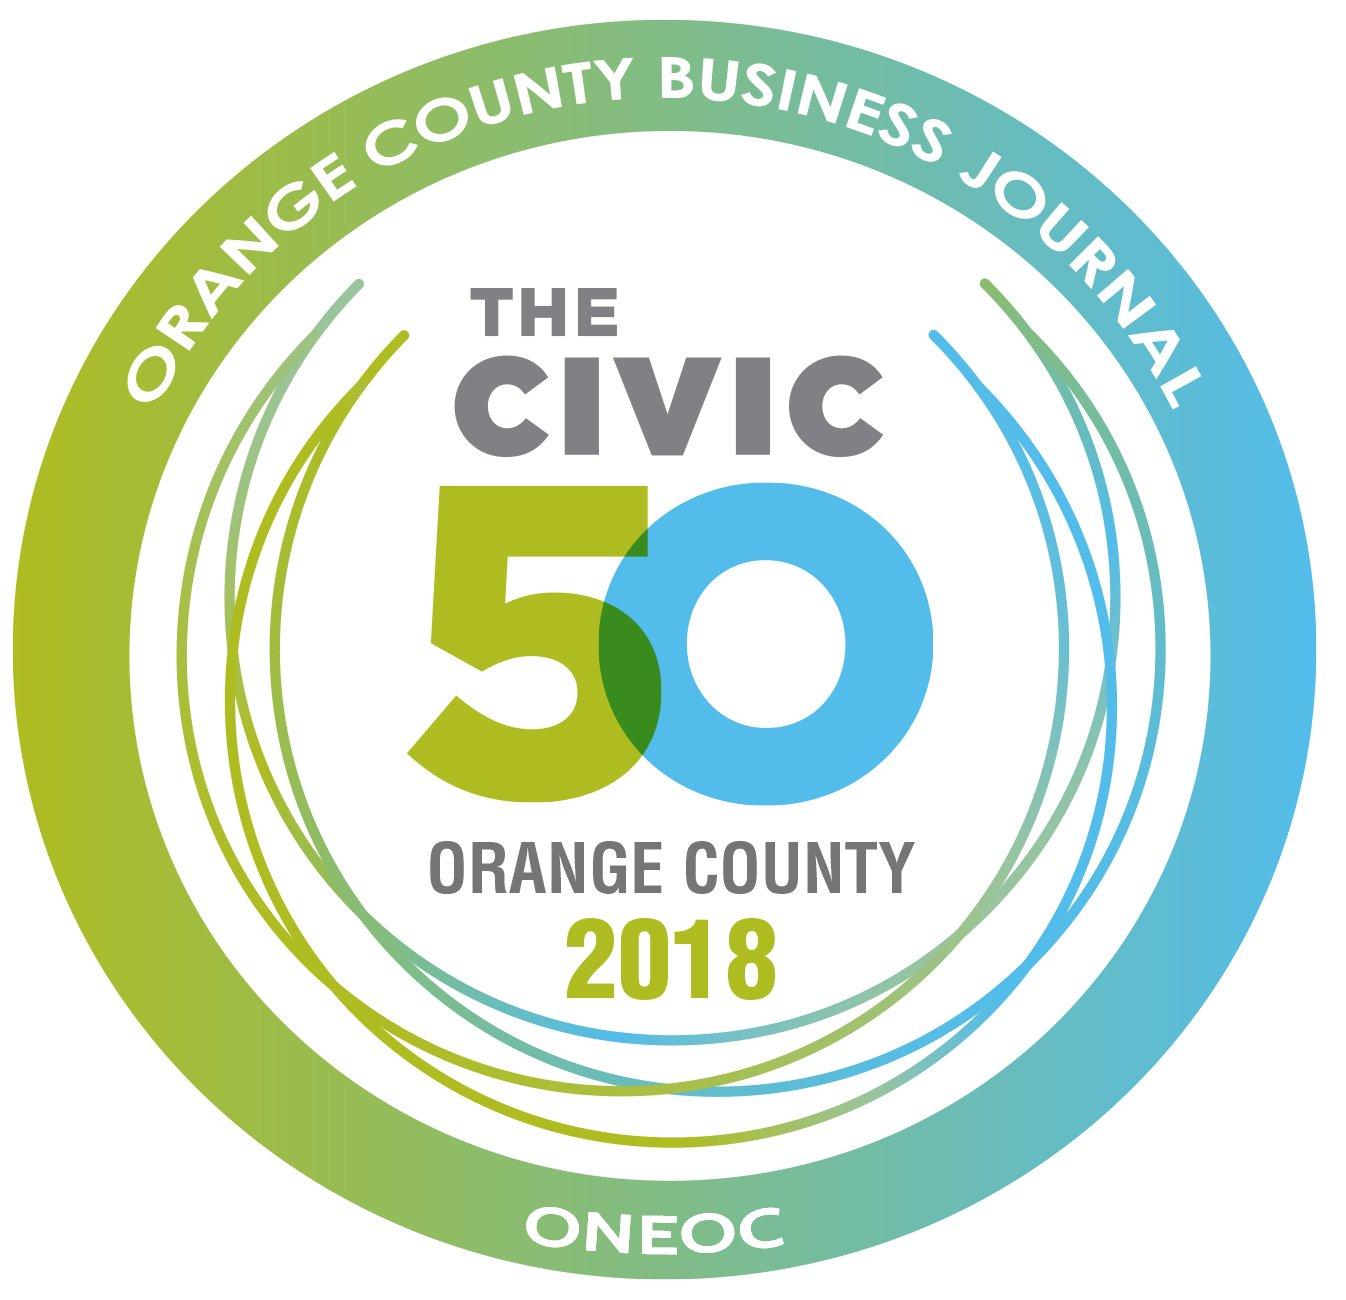 2018 Civic 50